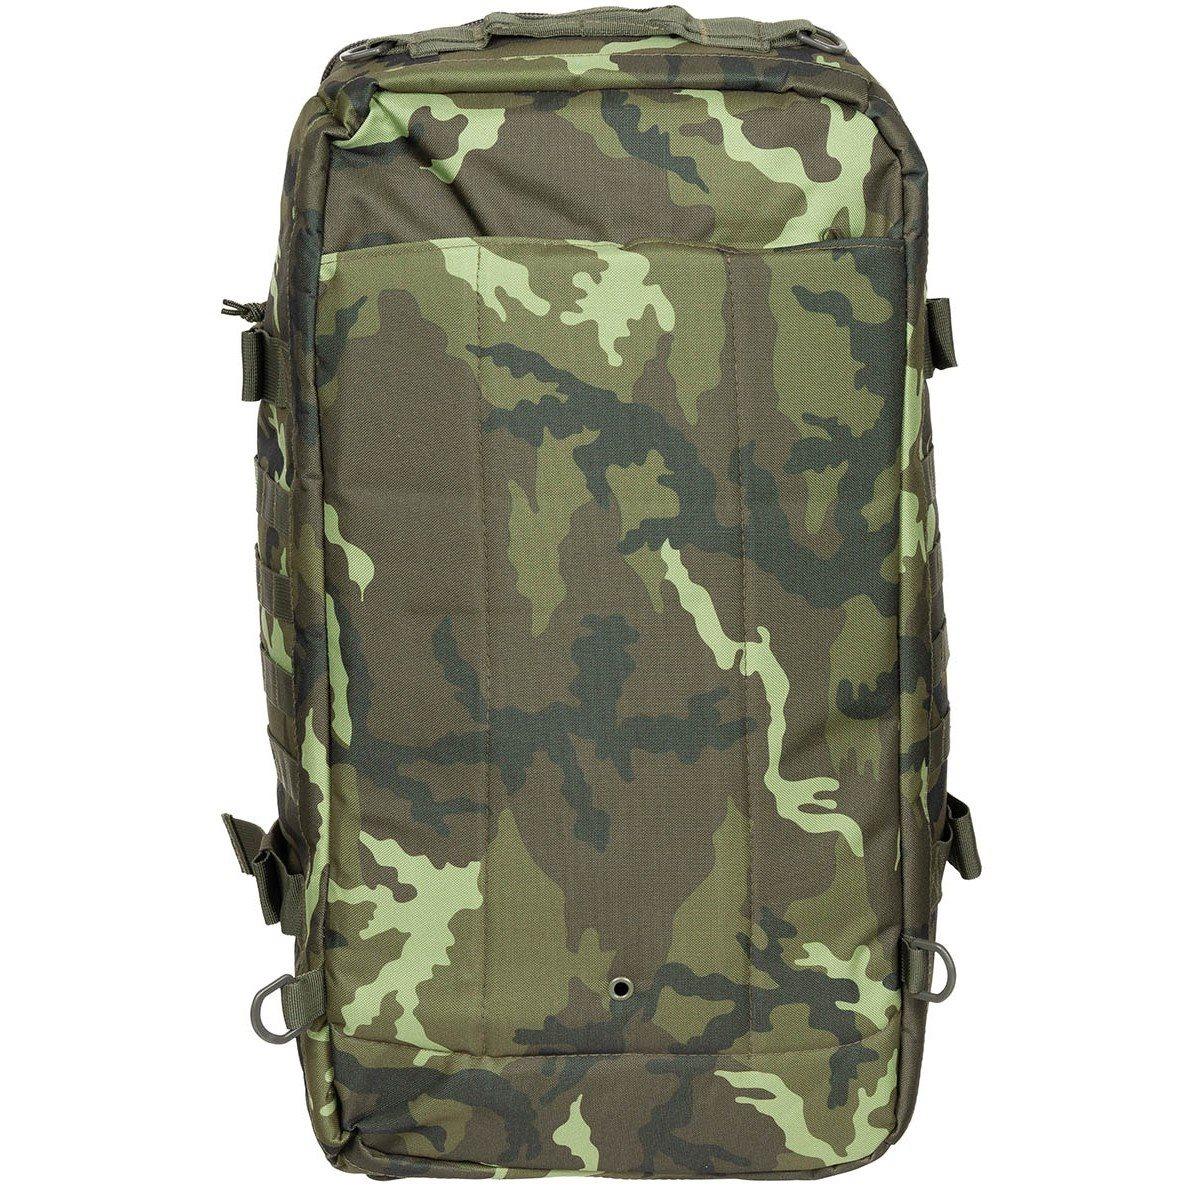 Taška kombinovaná s batohem TRAVEL MOLLE vz.95 les MFH int. comp. 30655J L-11